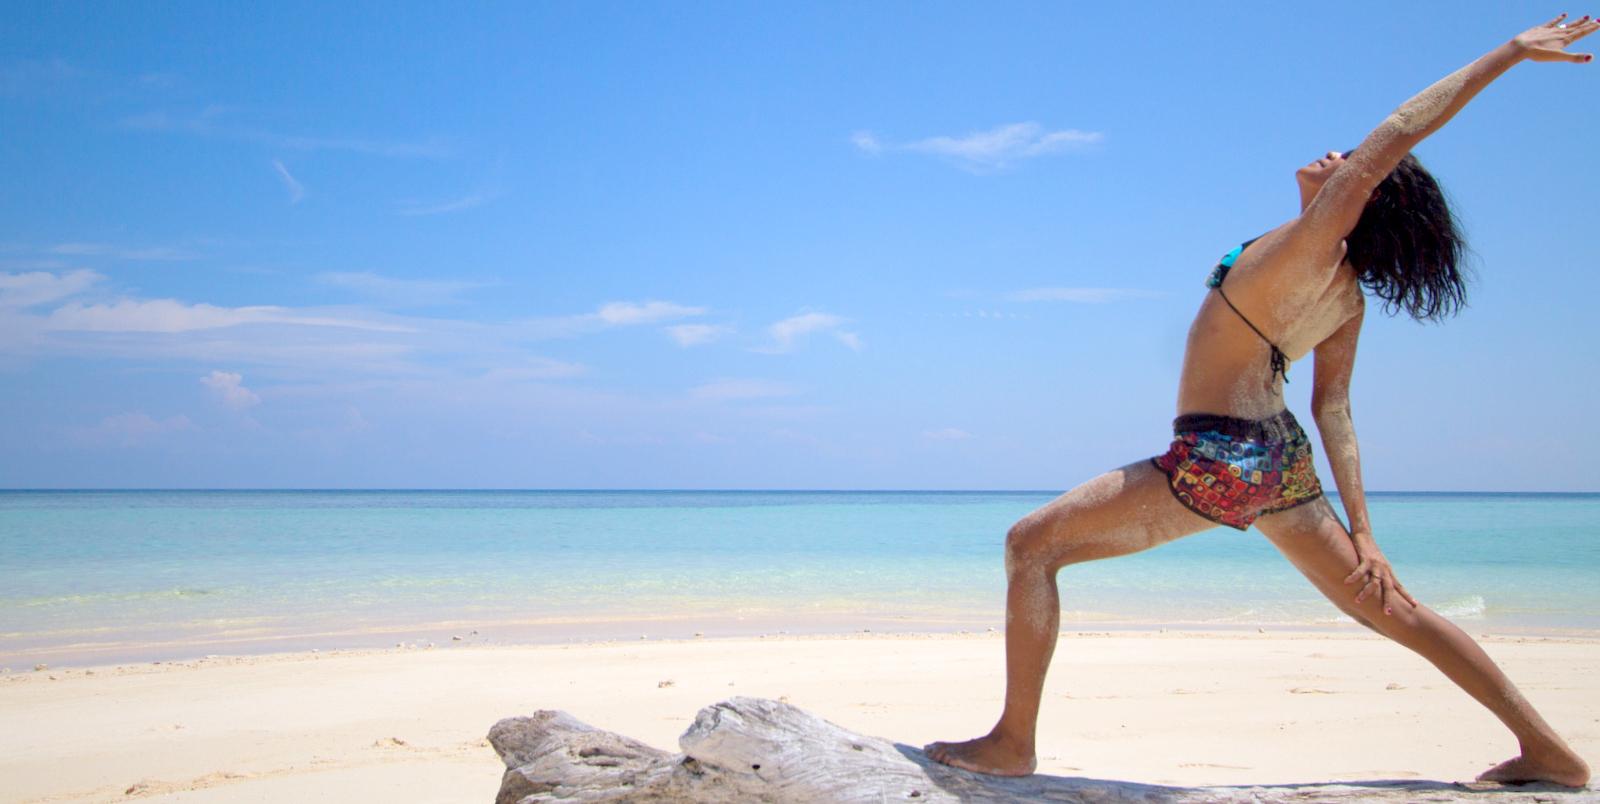 iir prihatinawati http://asianjasmine.yoga/